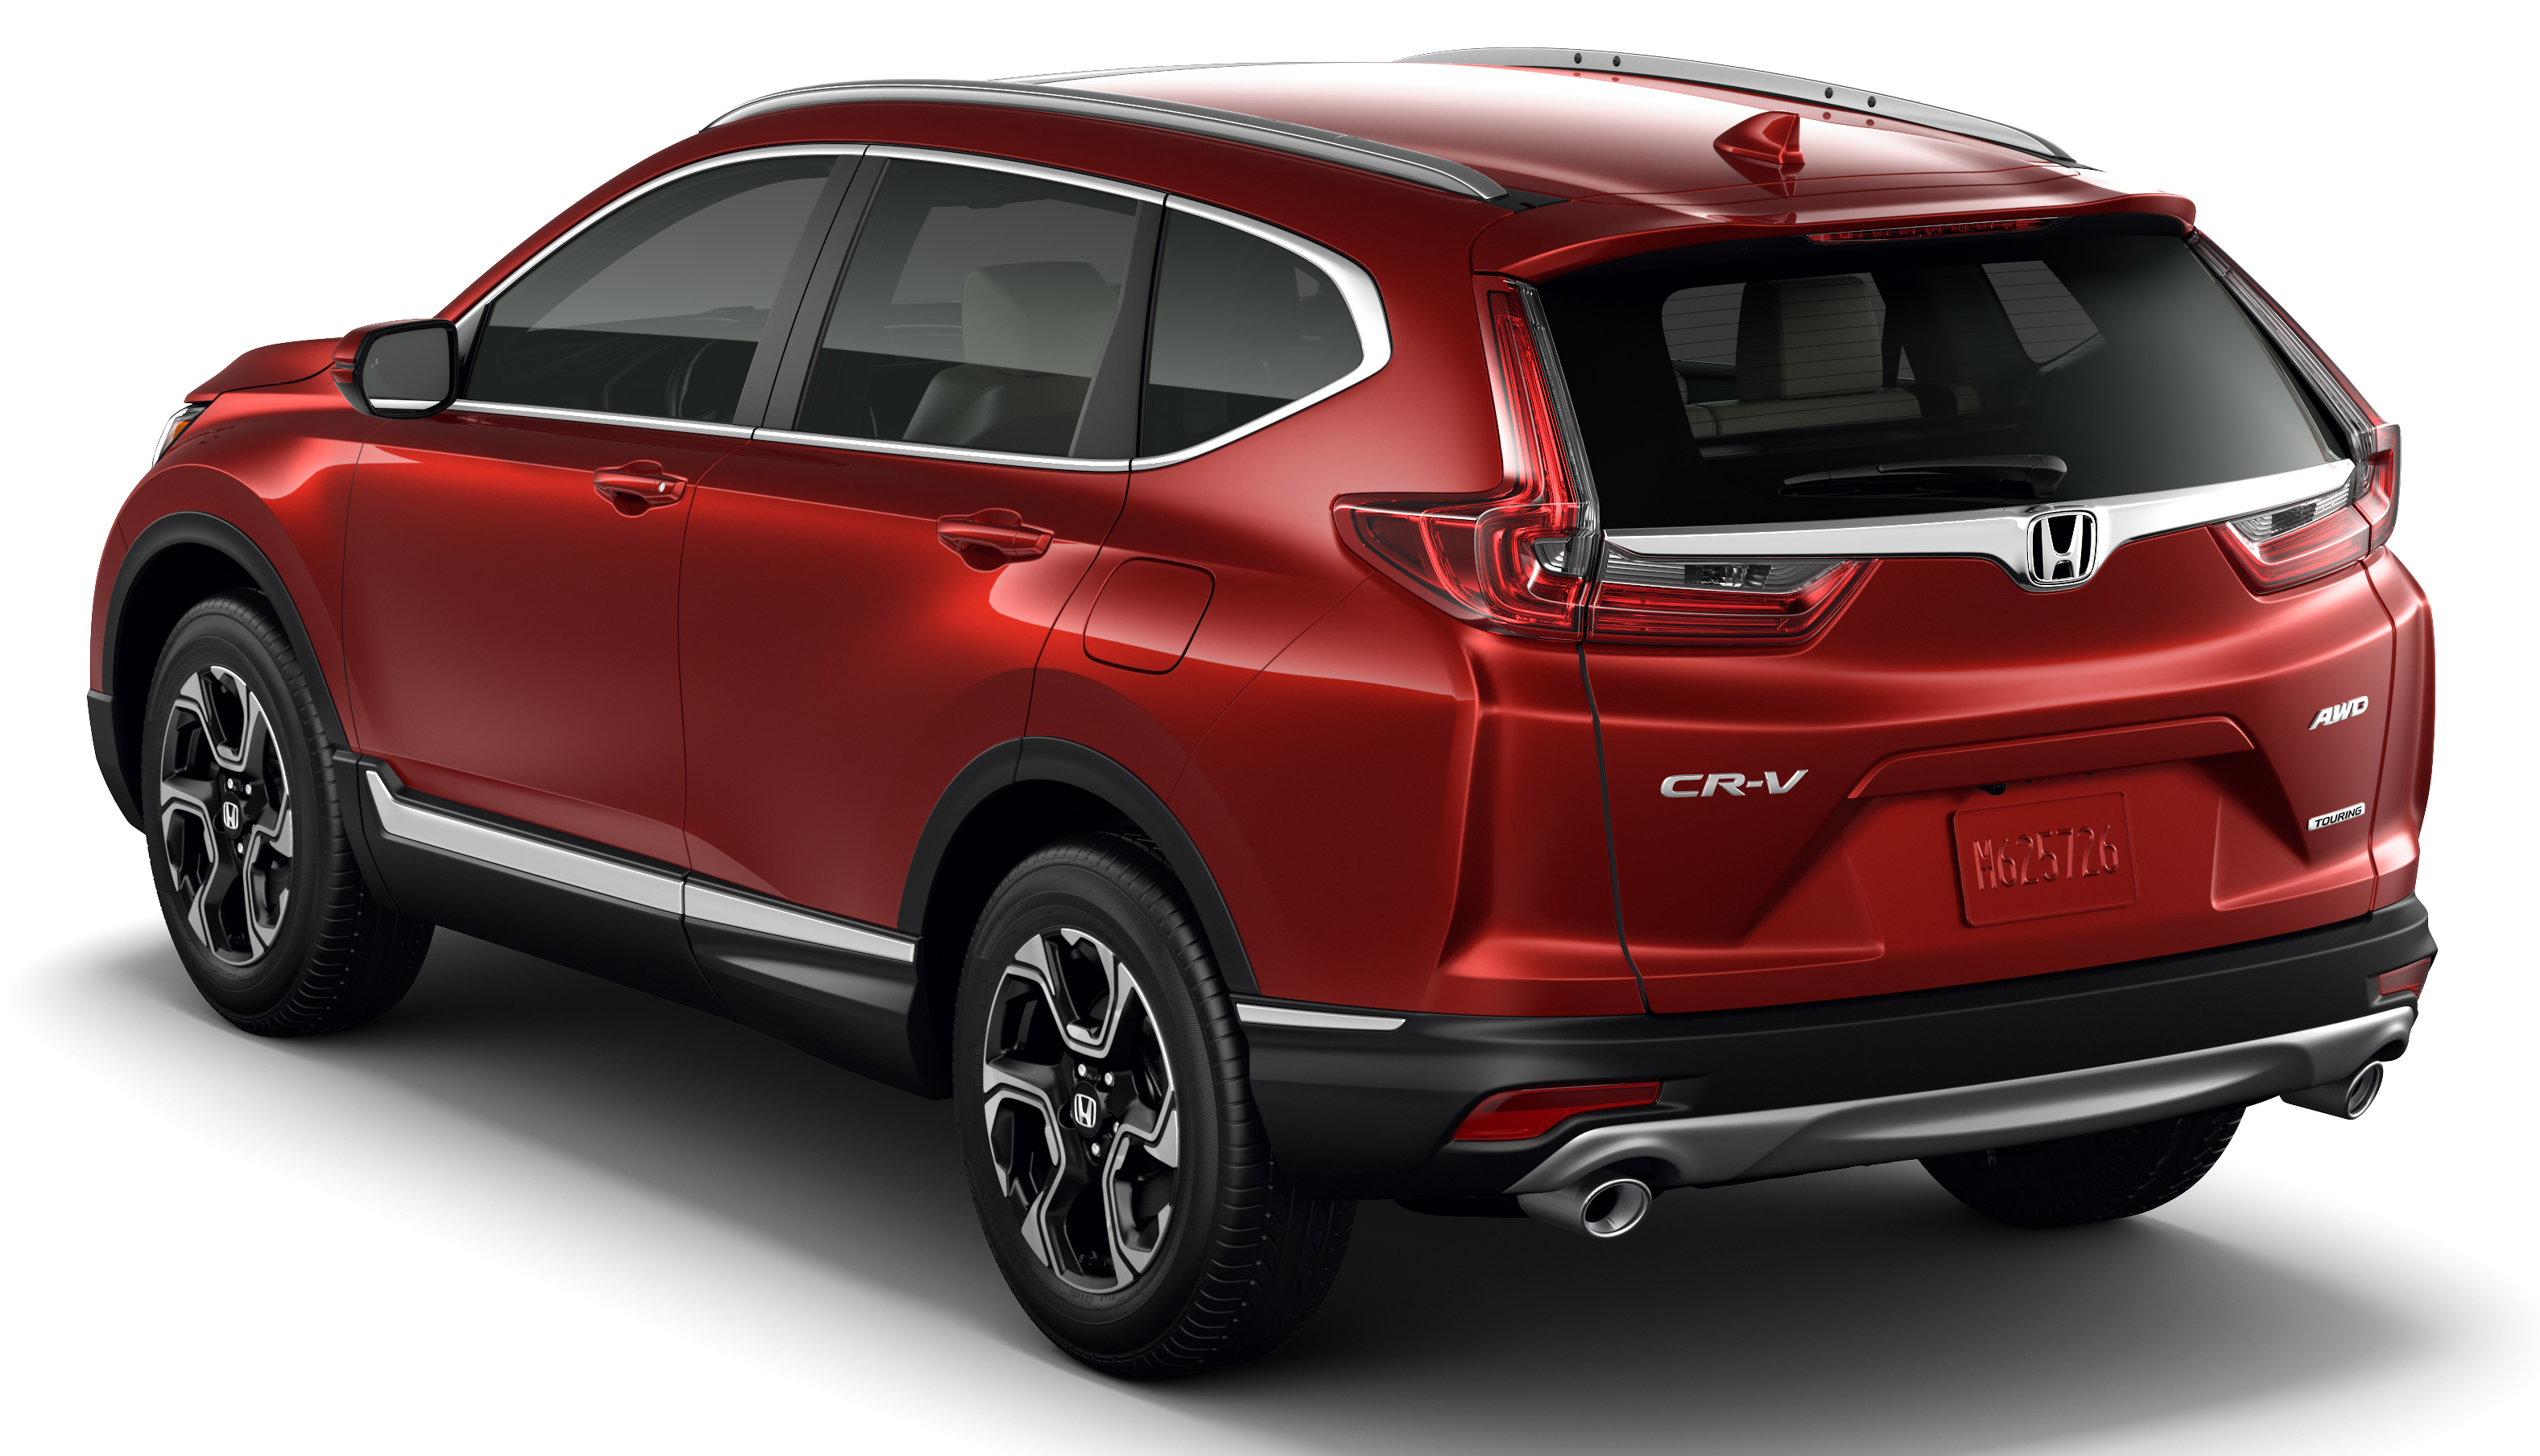 Honda Crv 2017 1.5 Turbo >> 2017 Honda CR-V unveiled – new 190 hp 1.5L turbo engine, premium interior, even more practical ...